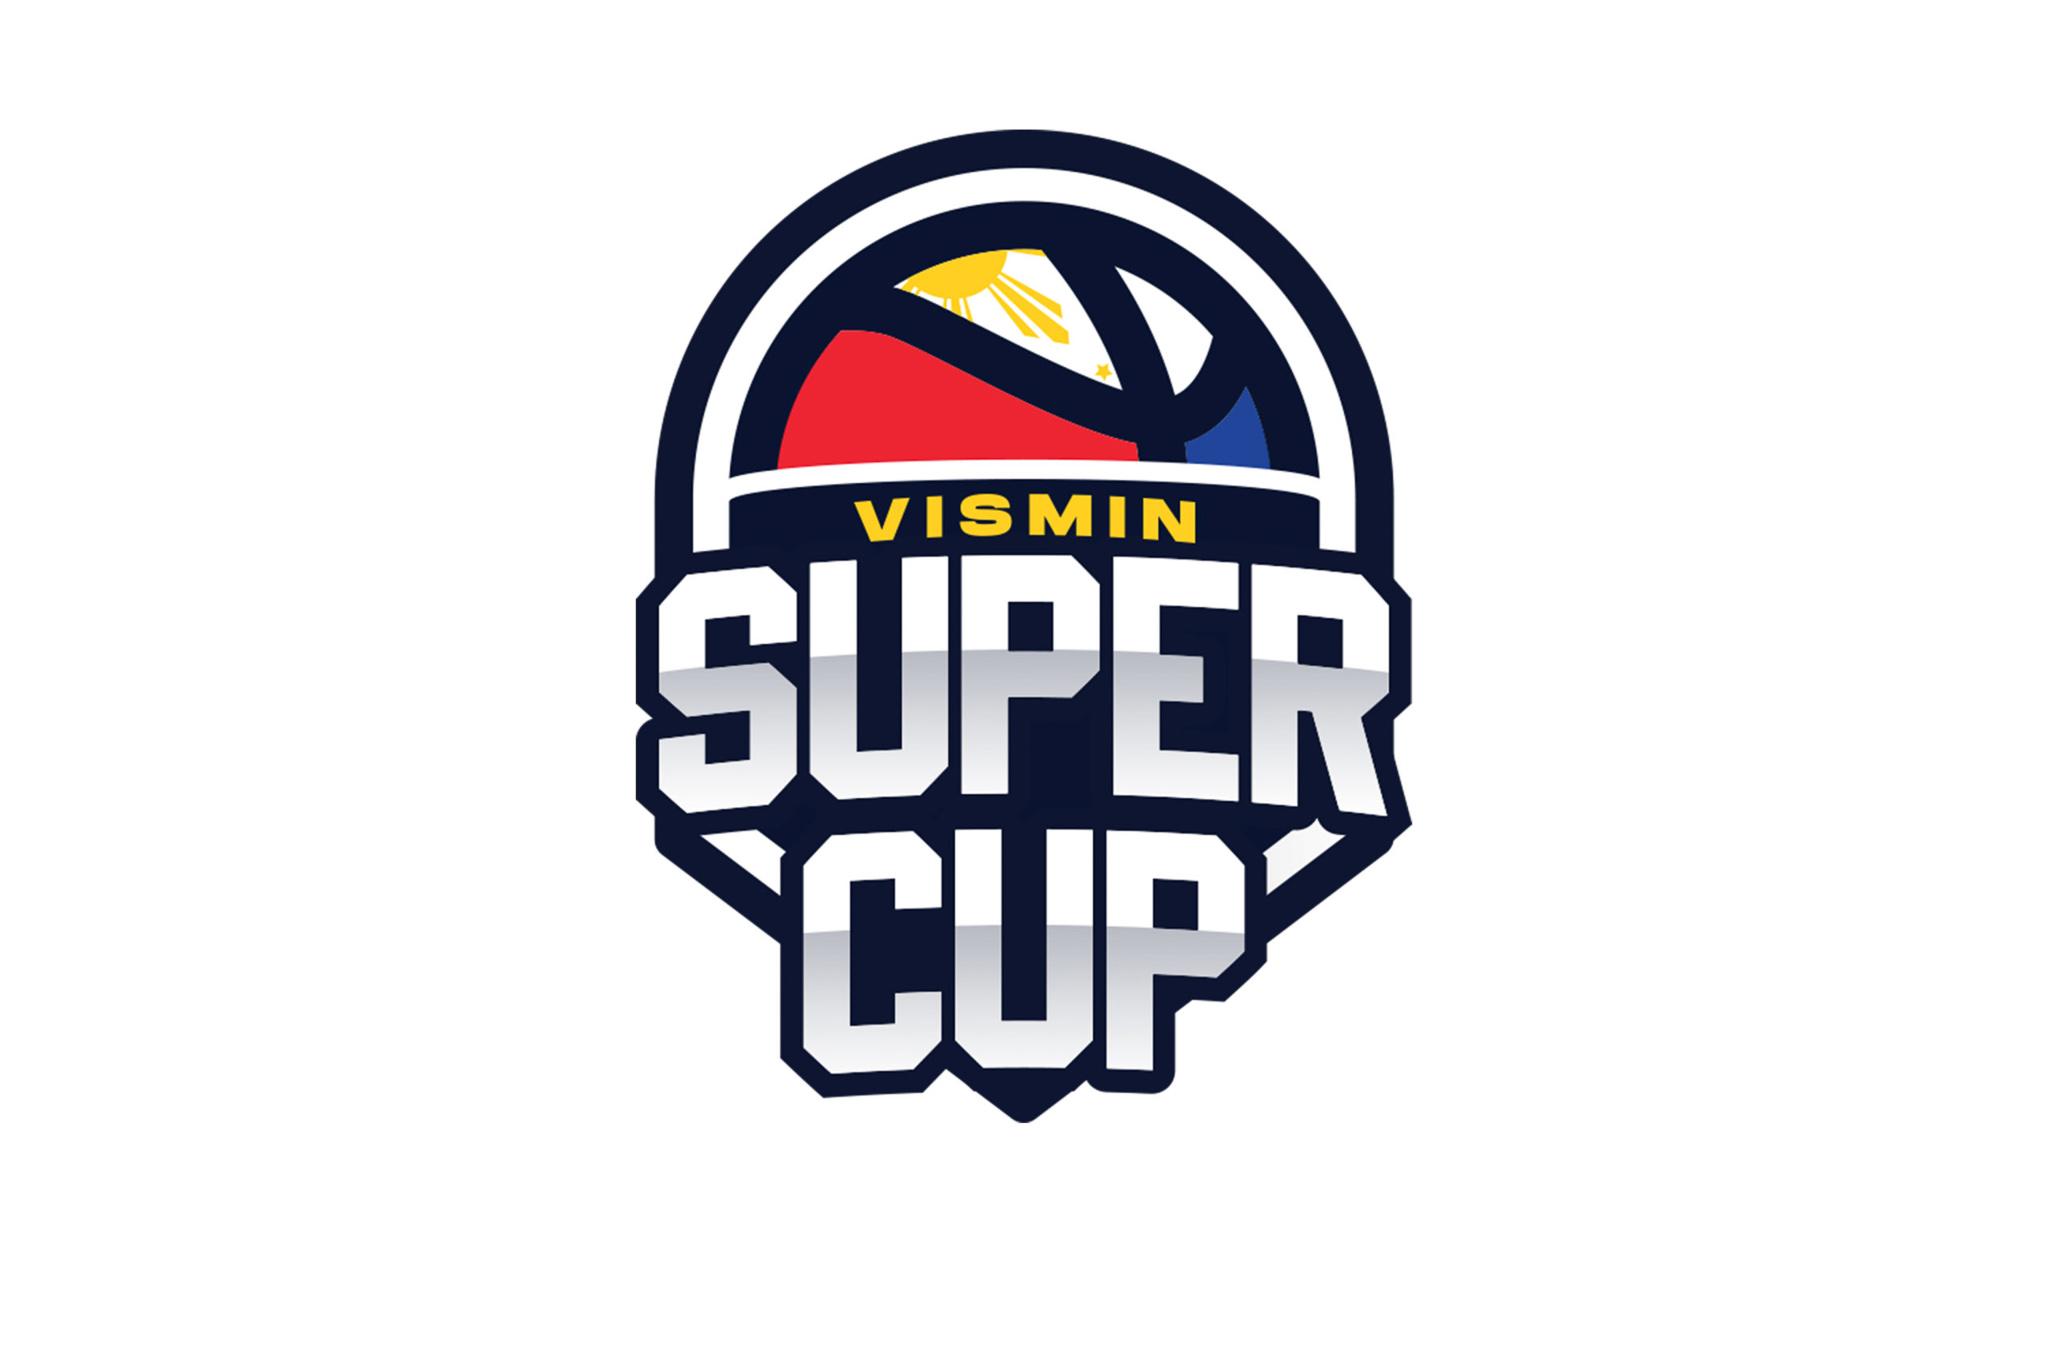 GAB reminds VisMin Super Cup to value integrity